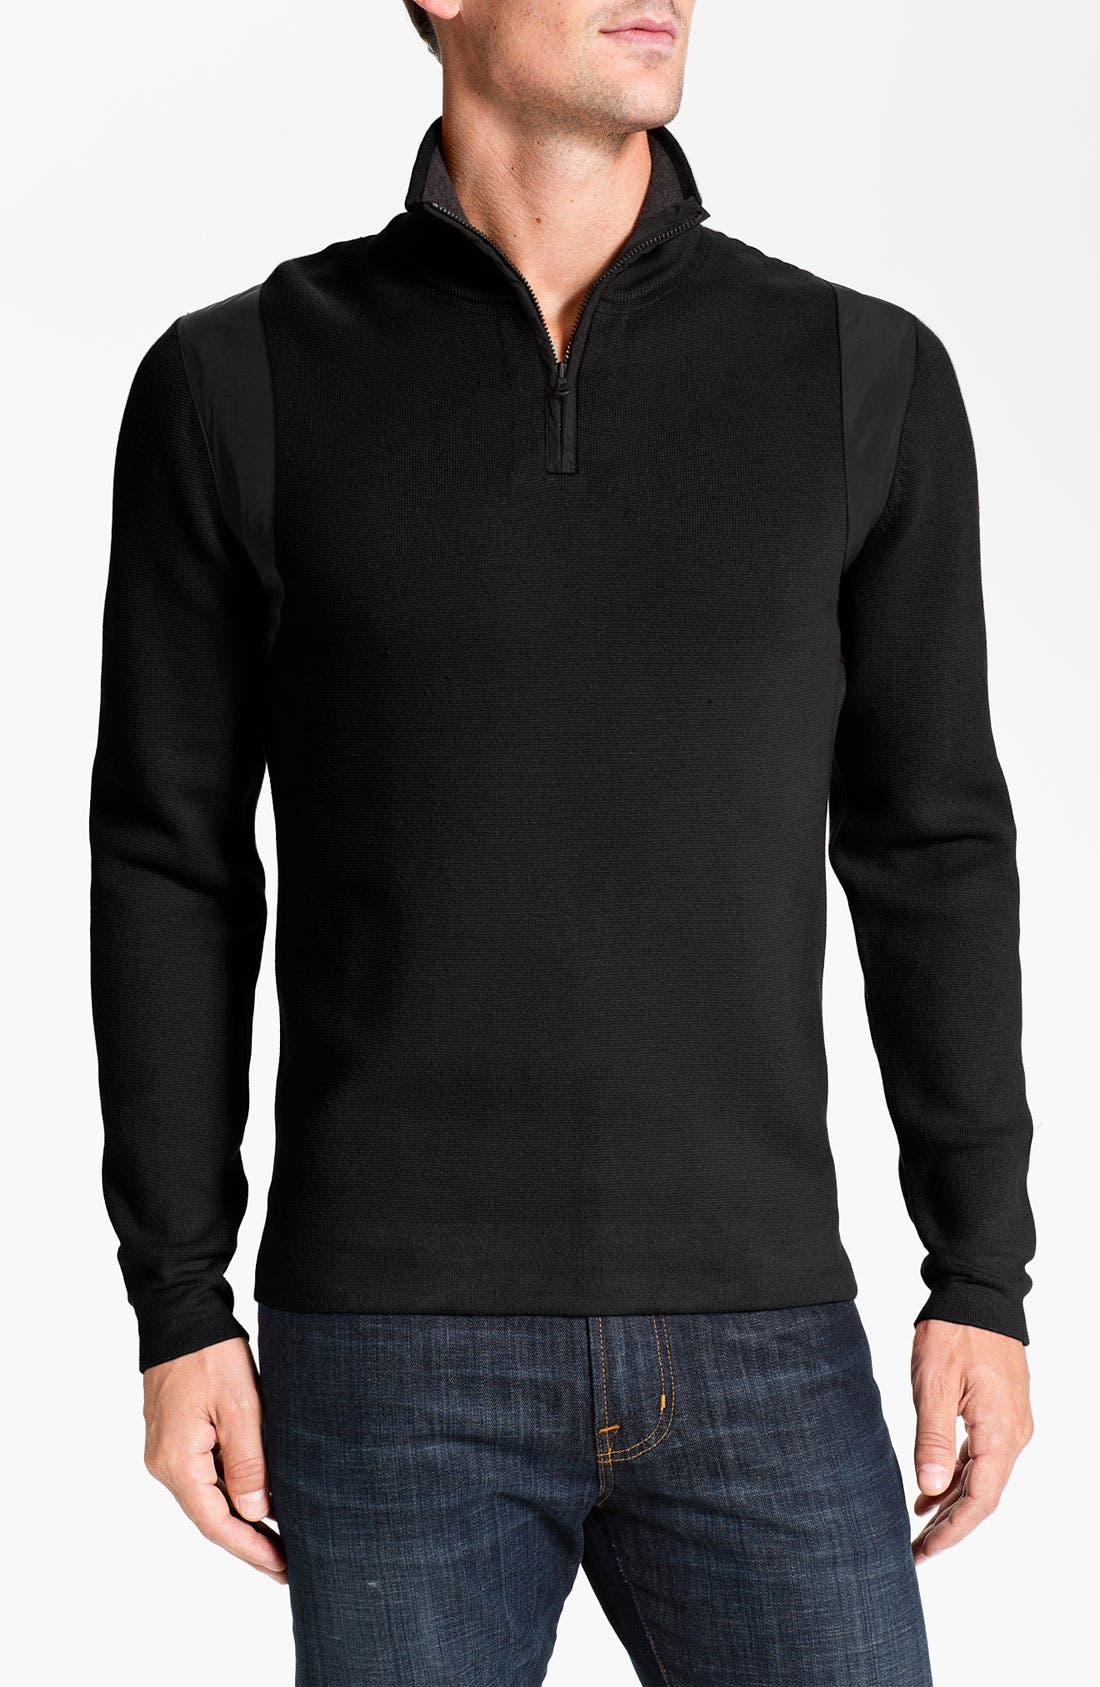 Alternate Image 1 Selected - Victorinox Swiss Army® 'Traveler' Quarter Zip Sweater (Online Exclusive)